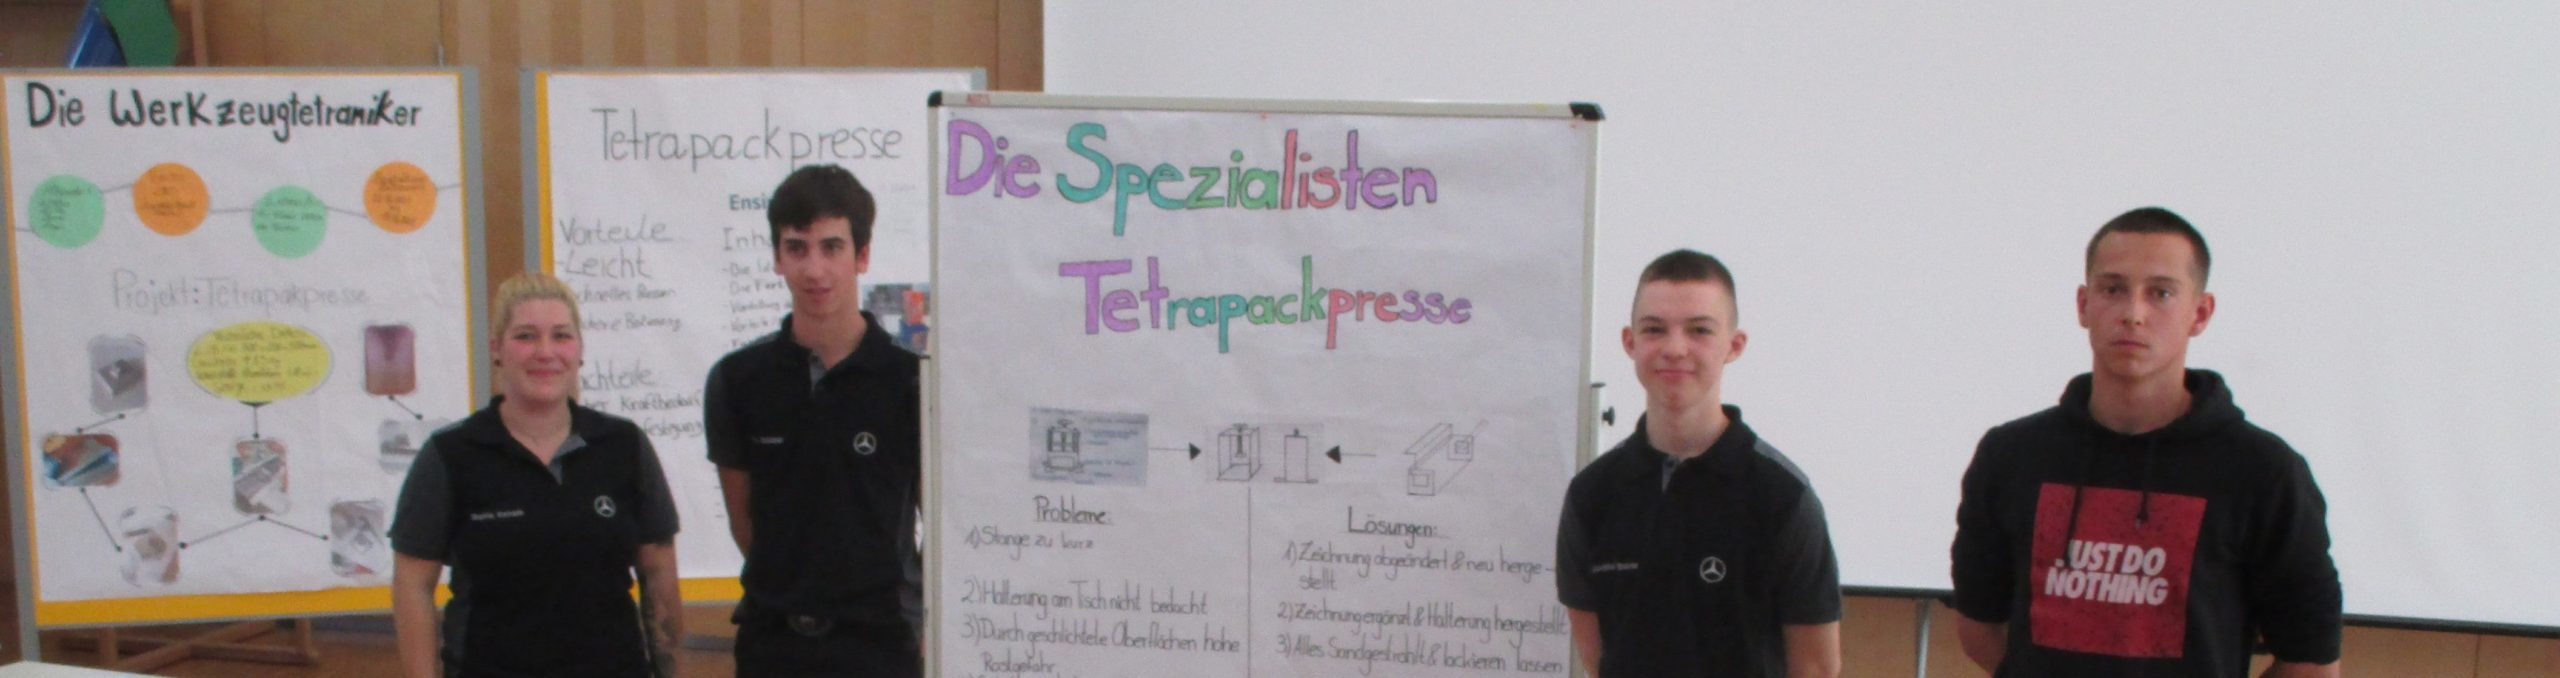 Tetrapakpresse Gruppe 7